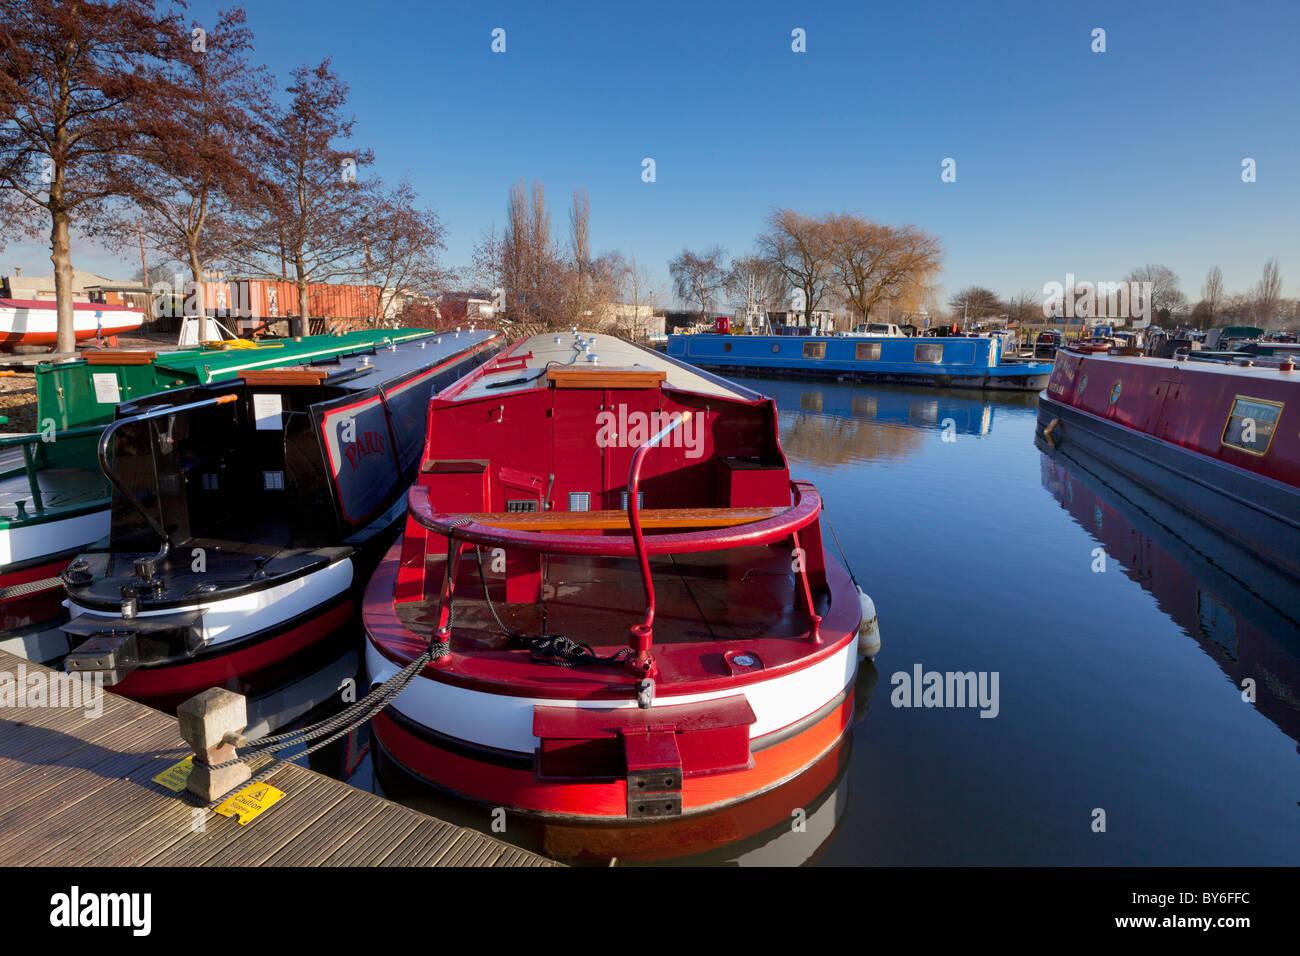 Narrow boats at Sawley marina Derbyshire England UK GB EU Europe - Stock Image